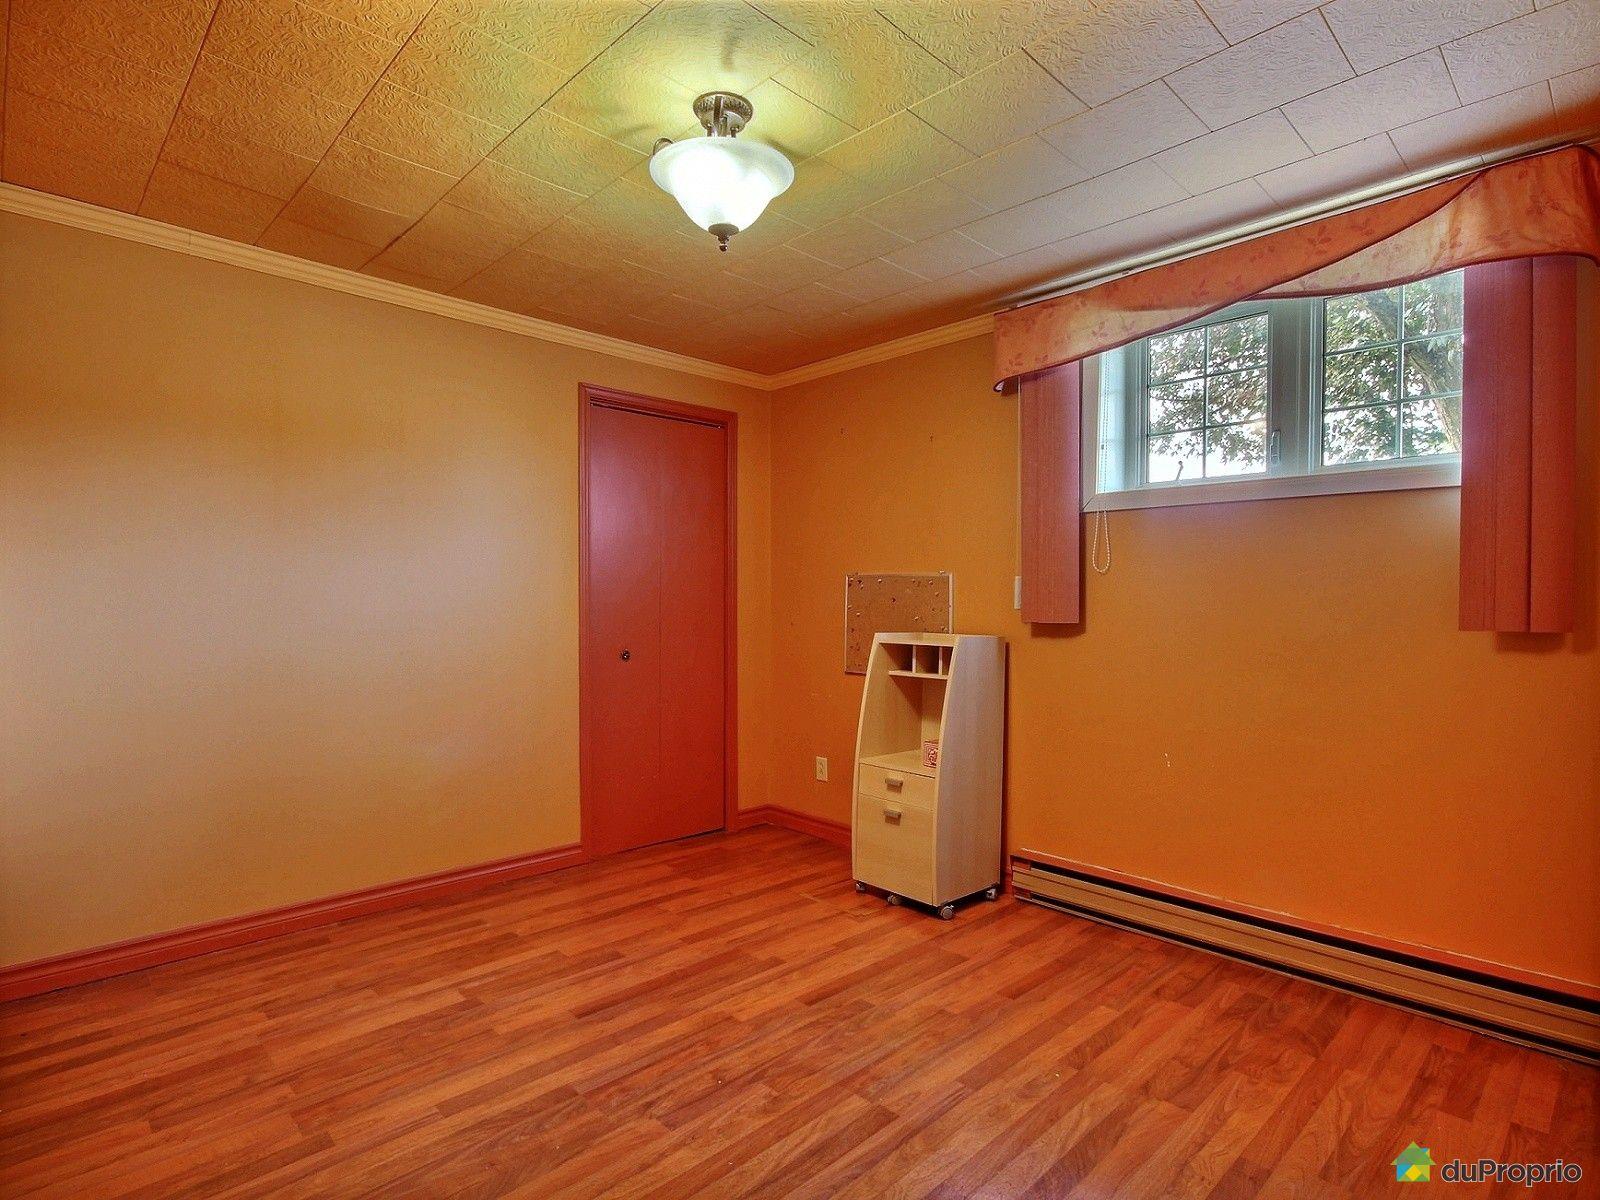 maison vendre dolbeau mistassini 170 avenue savary. Black Bedroom Furniture Sets. Home Design Ideas